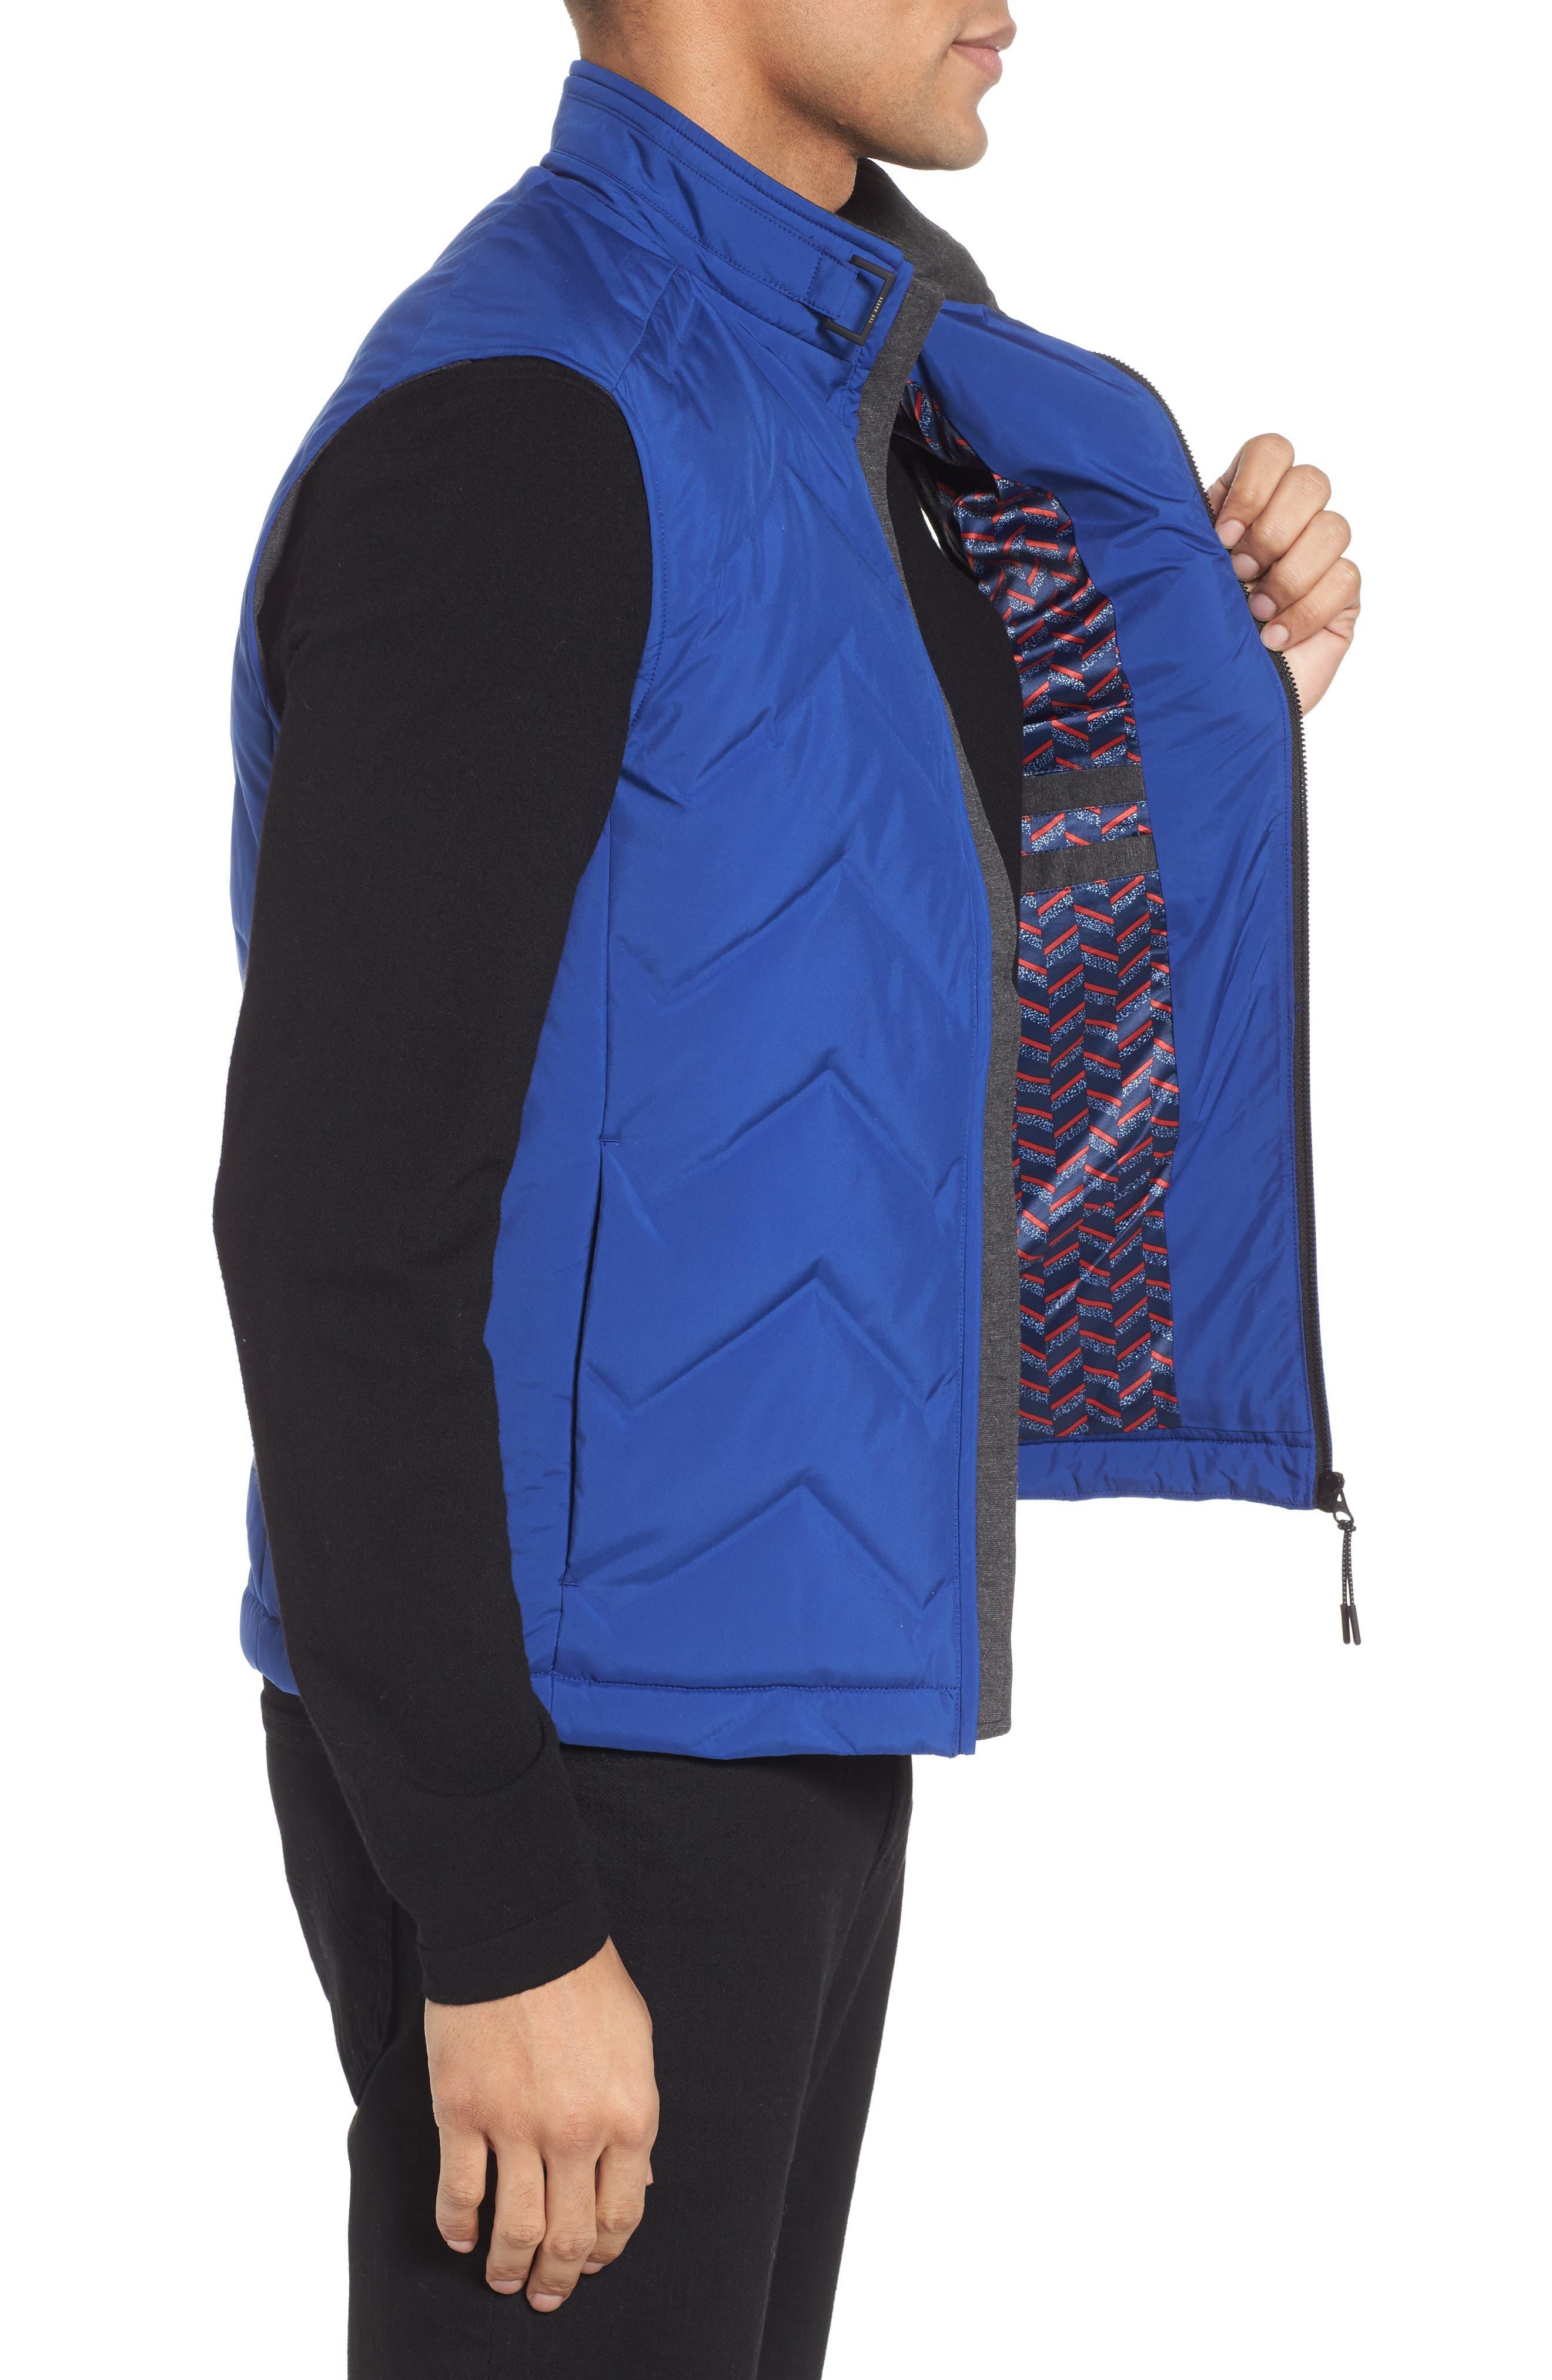 Hobart Down Vest,                             Alternate thumbnail 3, color,                             BRIGHT BLUE